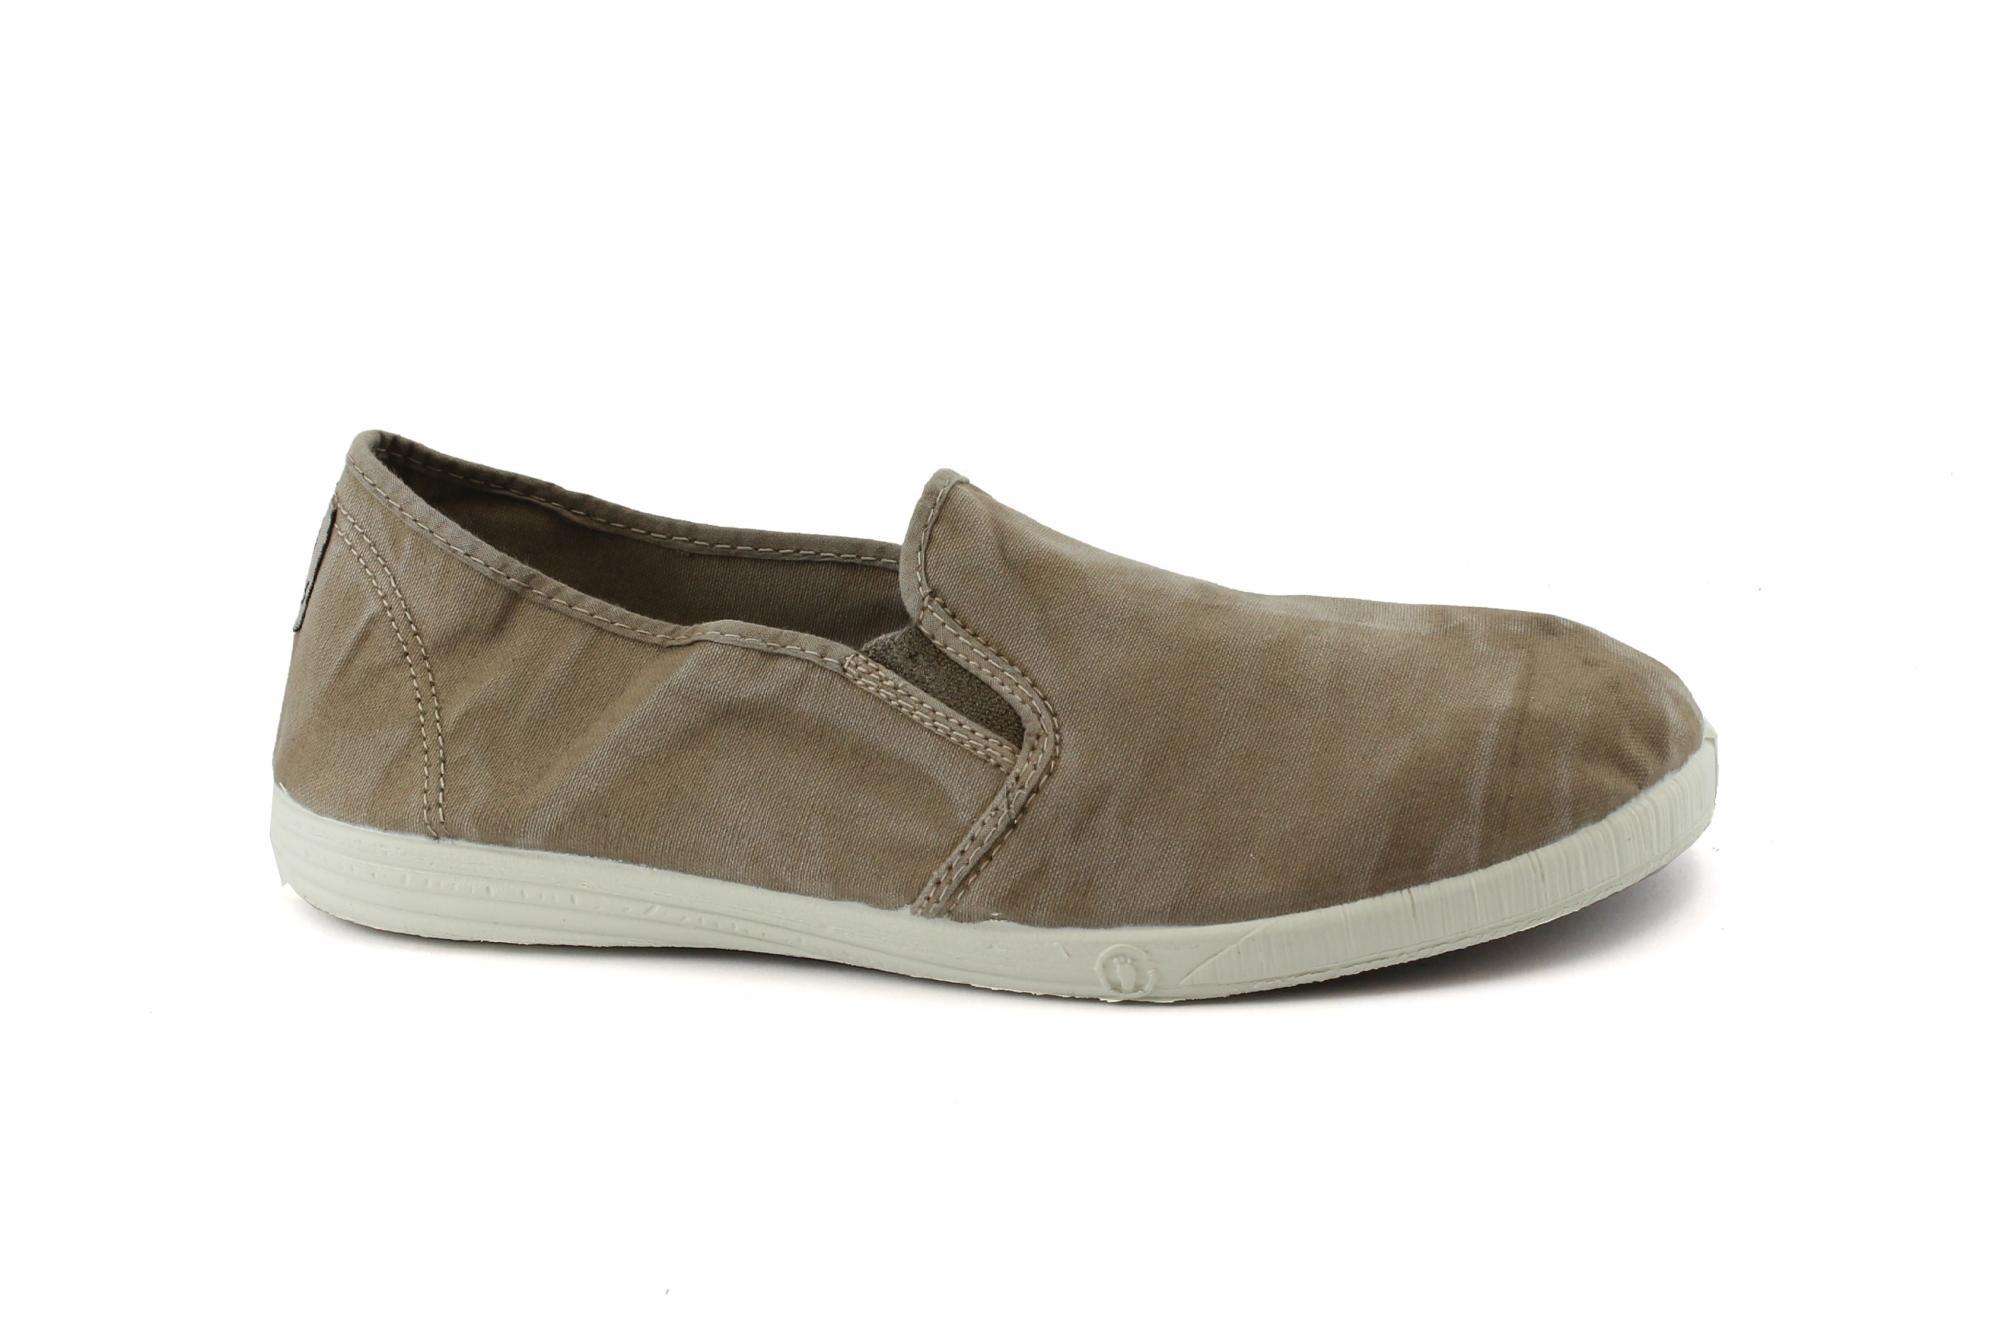 Shoes Salomon Neri Escape Sense Da Pkiuxz Amazon Corsa 2 W29EHDIY